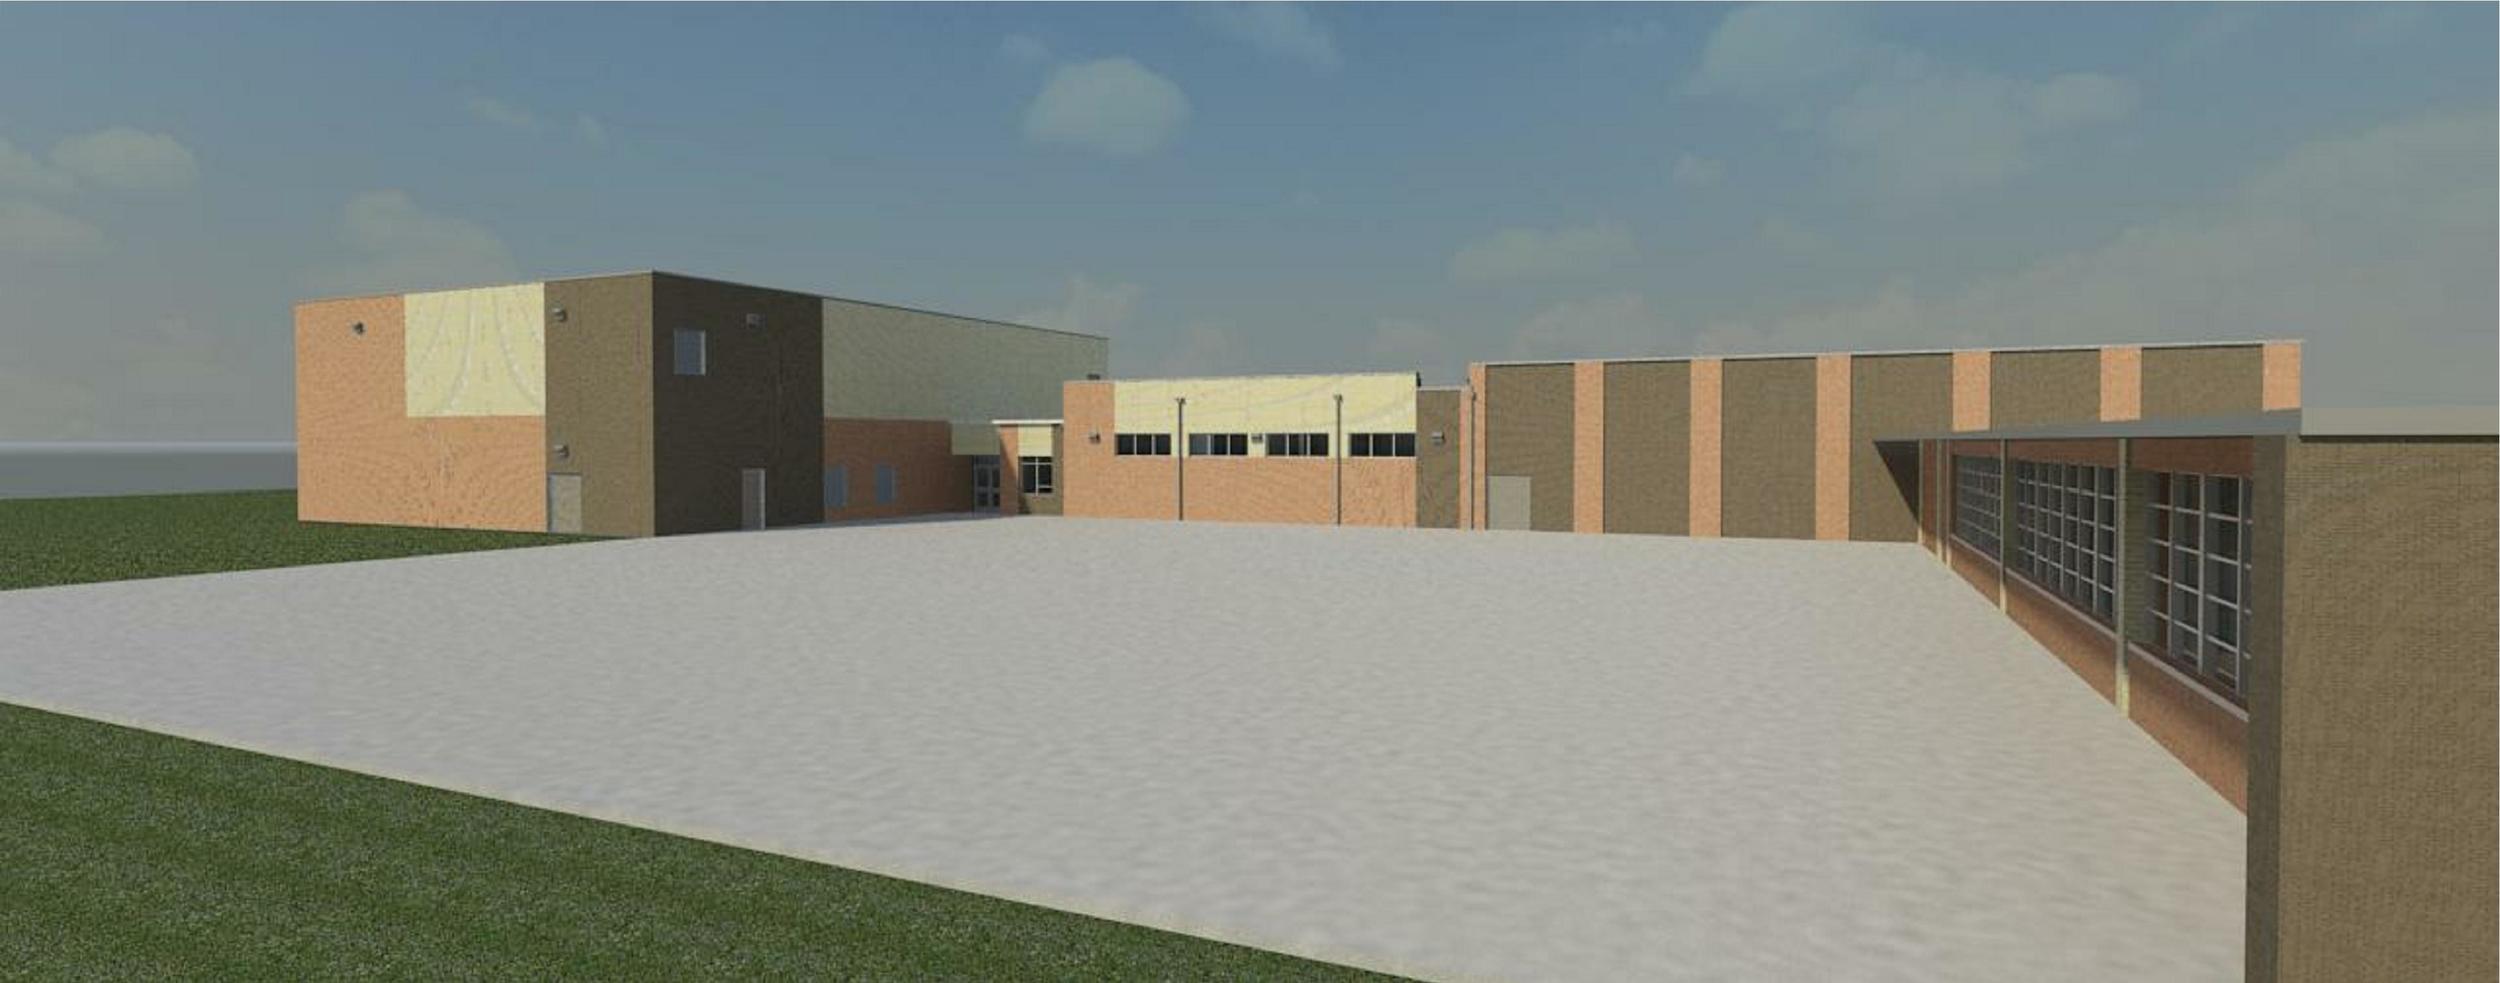 McEachron Elementary_Central - Rendering - Playground View III.jpg